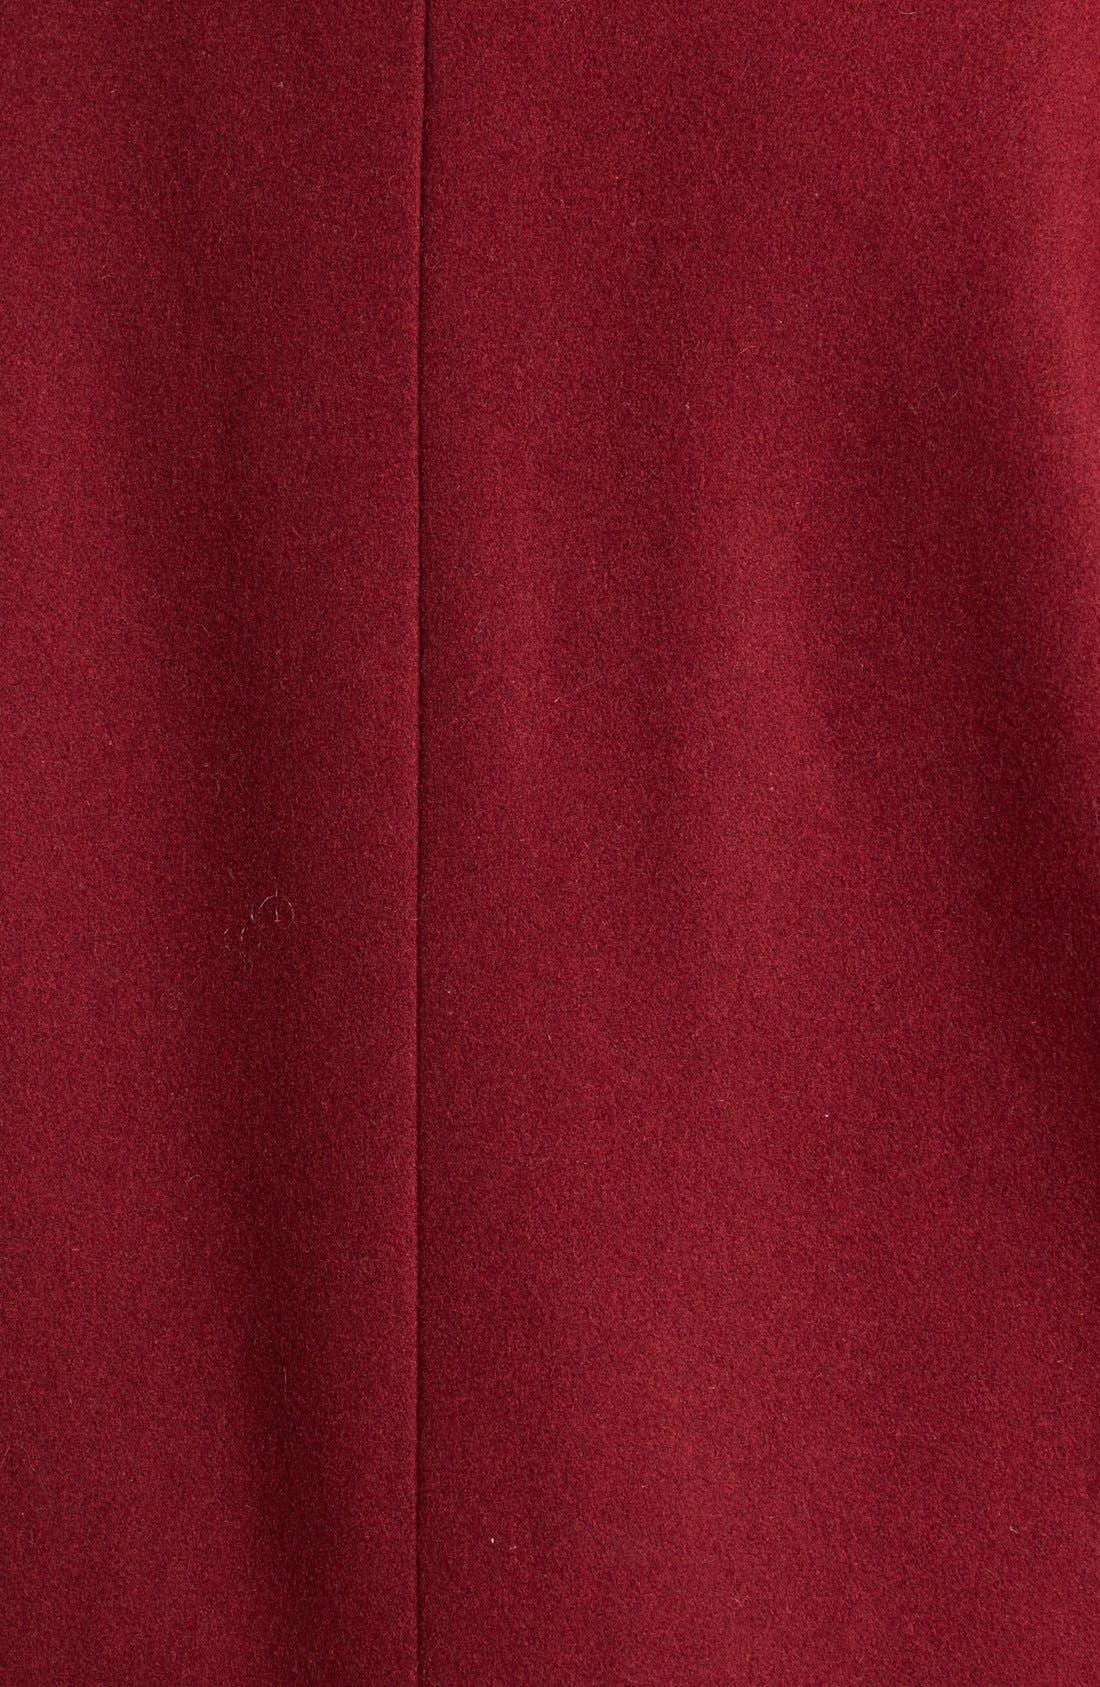 Alternate Image 3  - Ellen Tracy 'Clutch' Coat (Plus Size)